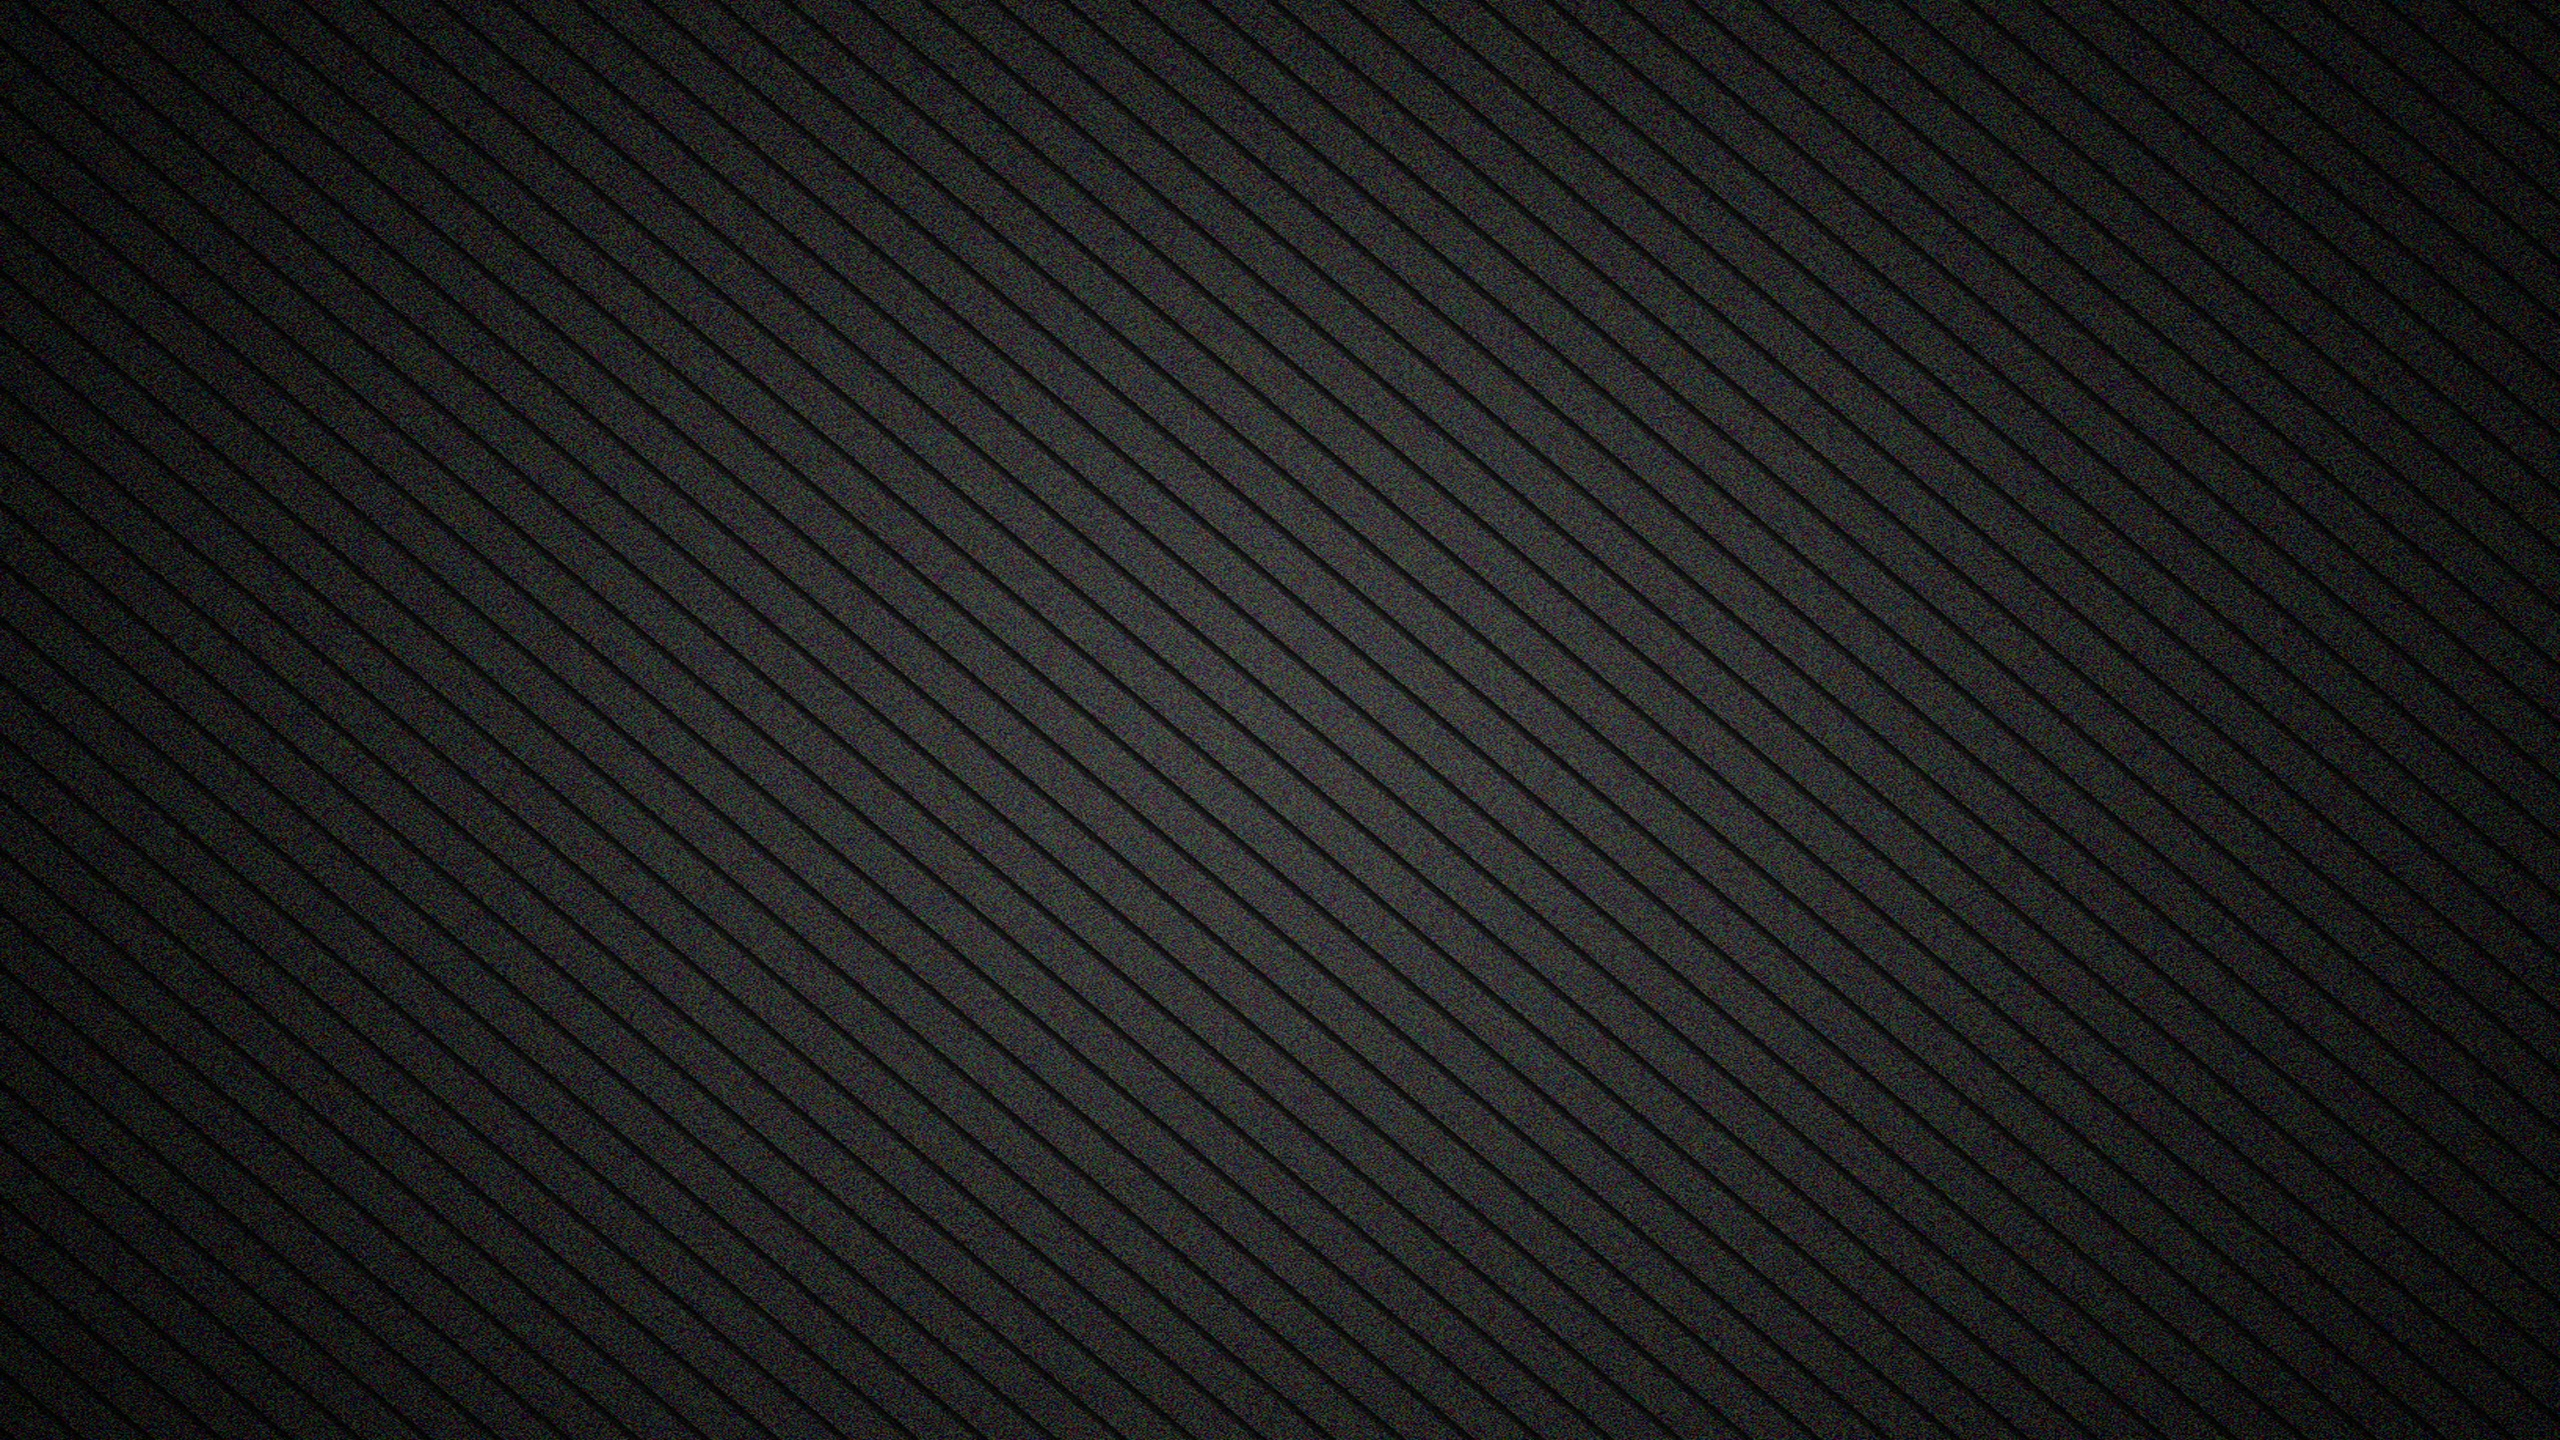 51 2560x1440 Wallpapers On Wallpapersafari